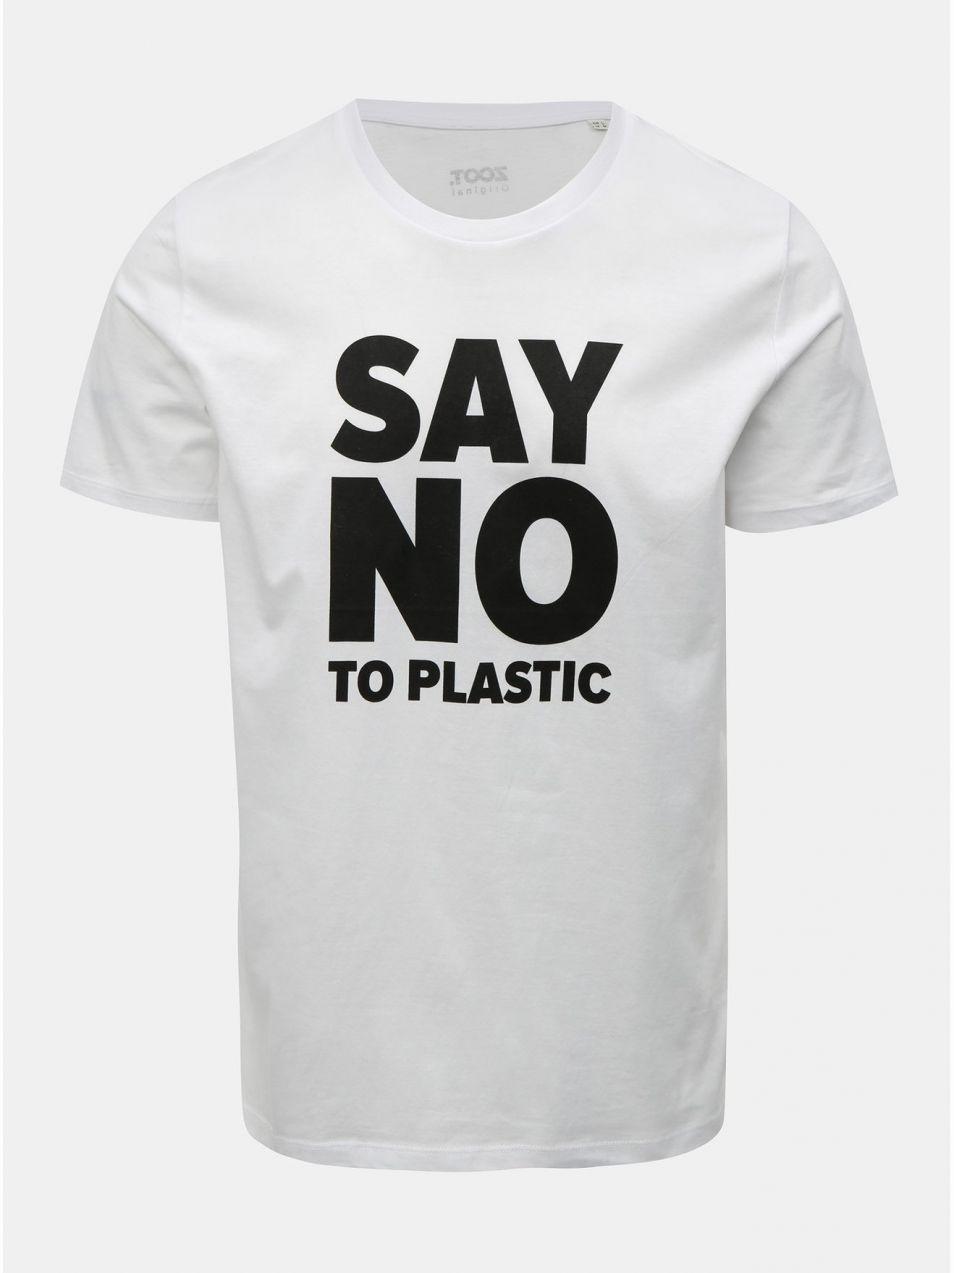 b12d71d1dcf1e Biele pánske tričko s potlačou ZOOT Original Say no to plastic ...